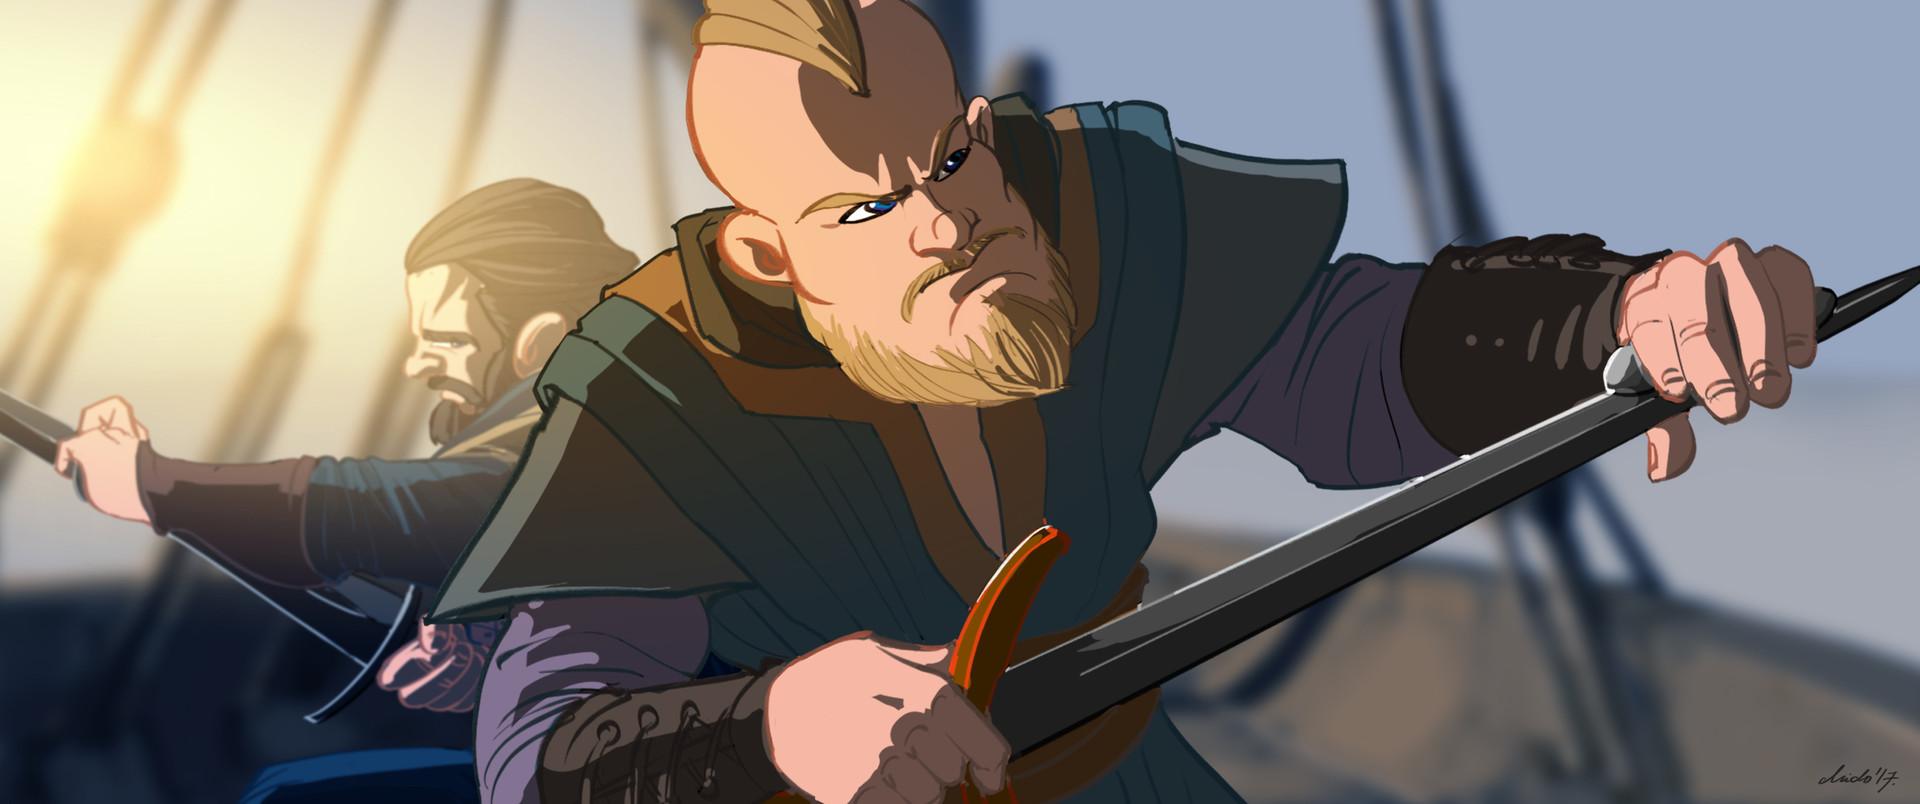 Midhat kapetanovic vikings cartoon 02